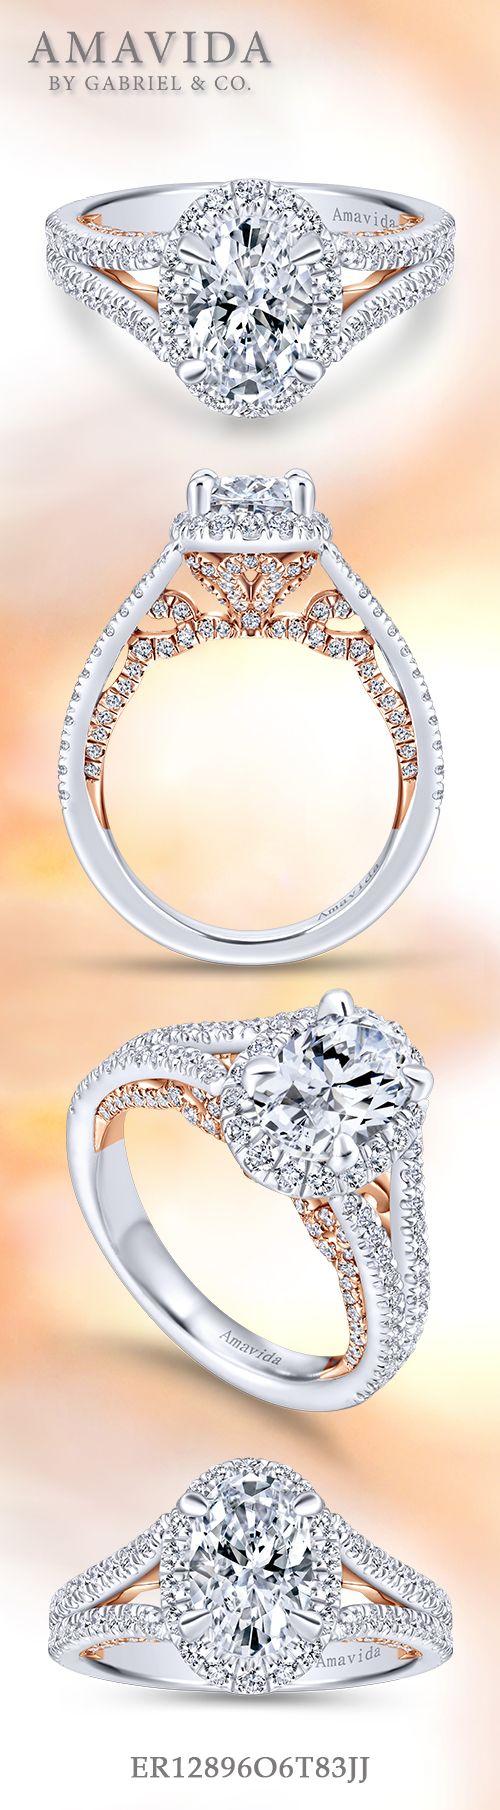 Susanna 18k White And Rose Gold Emerald Cut Halo Engagement Ring   Er12897e6t83jj